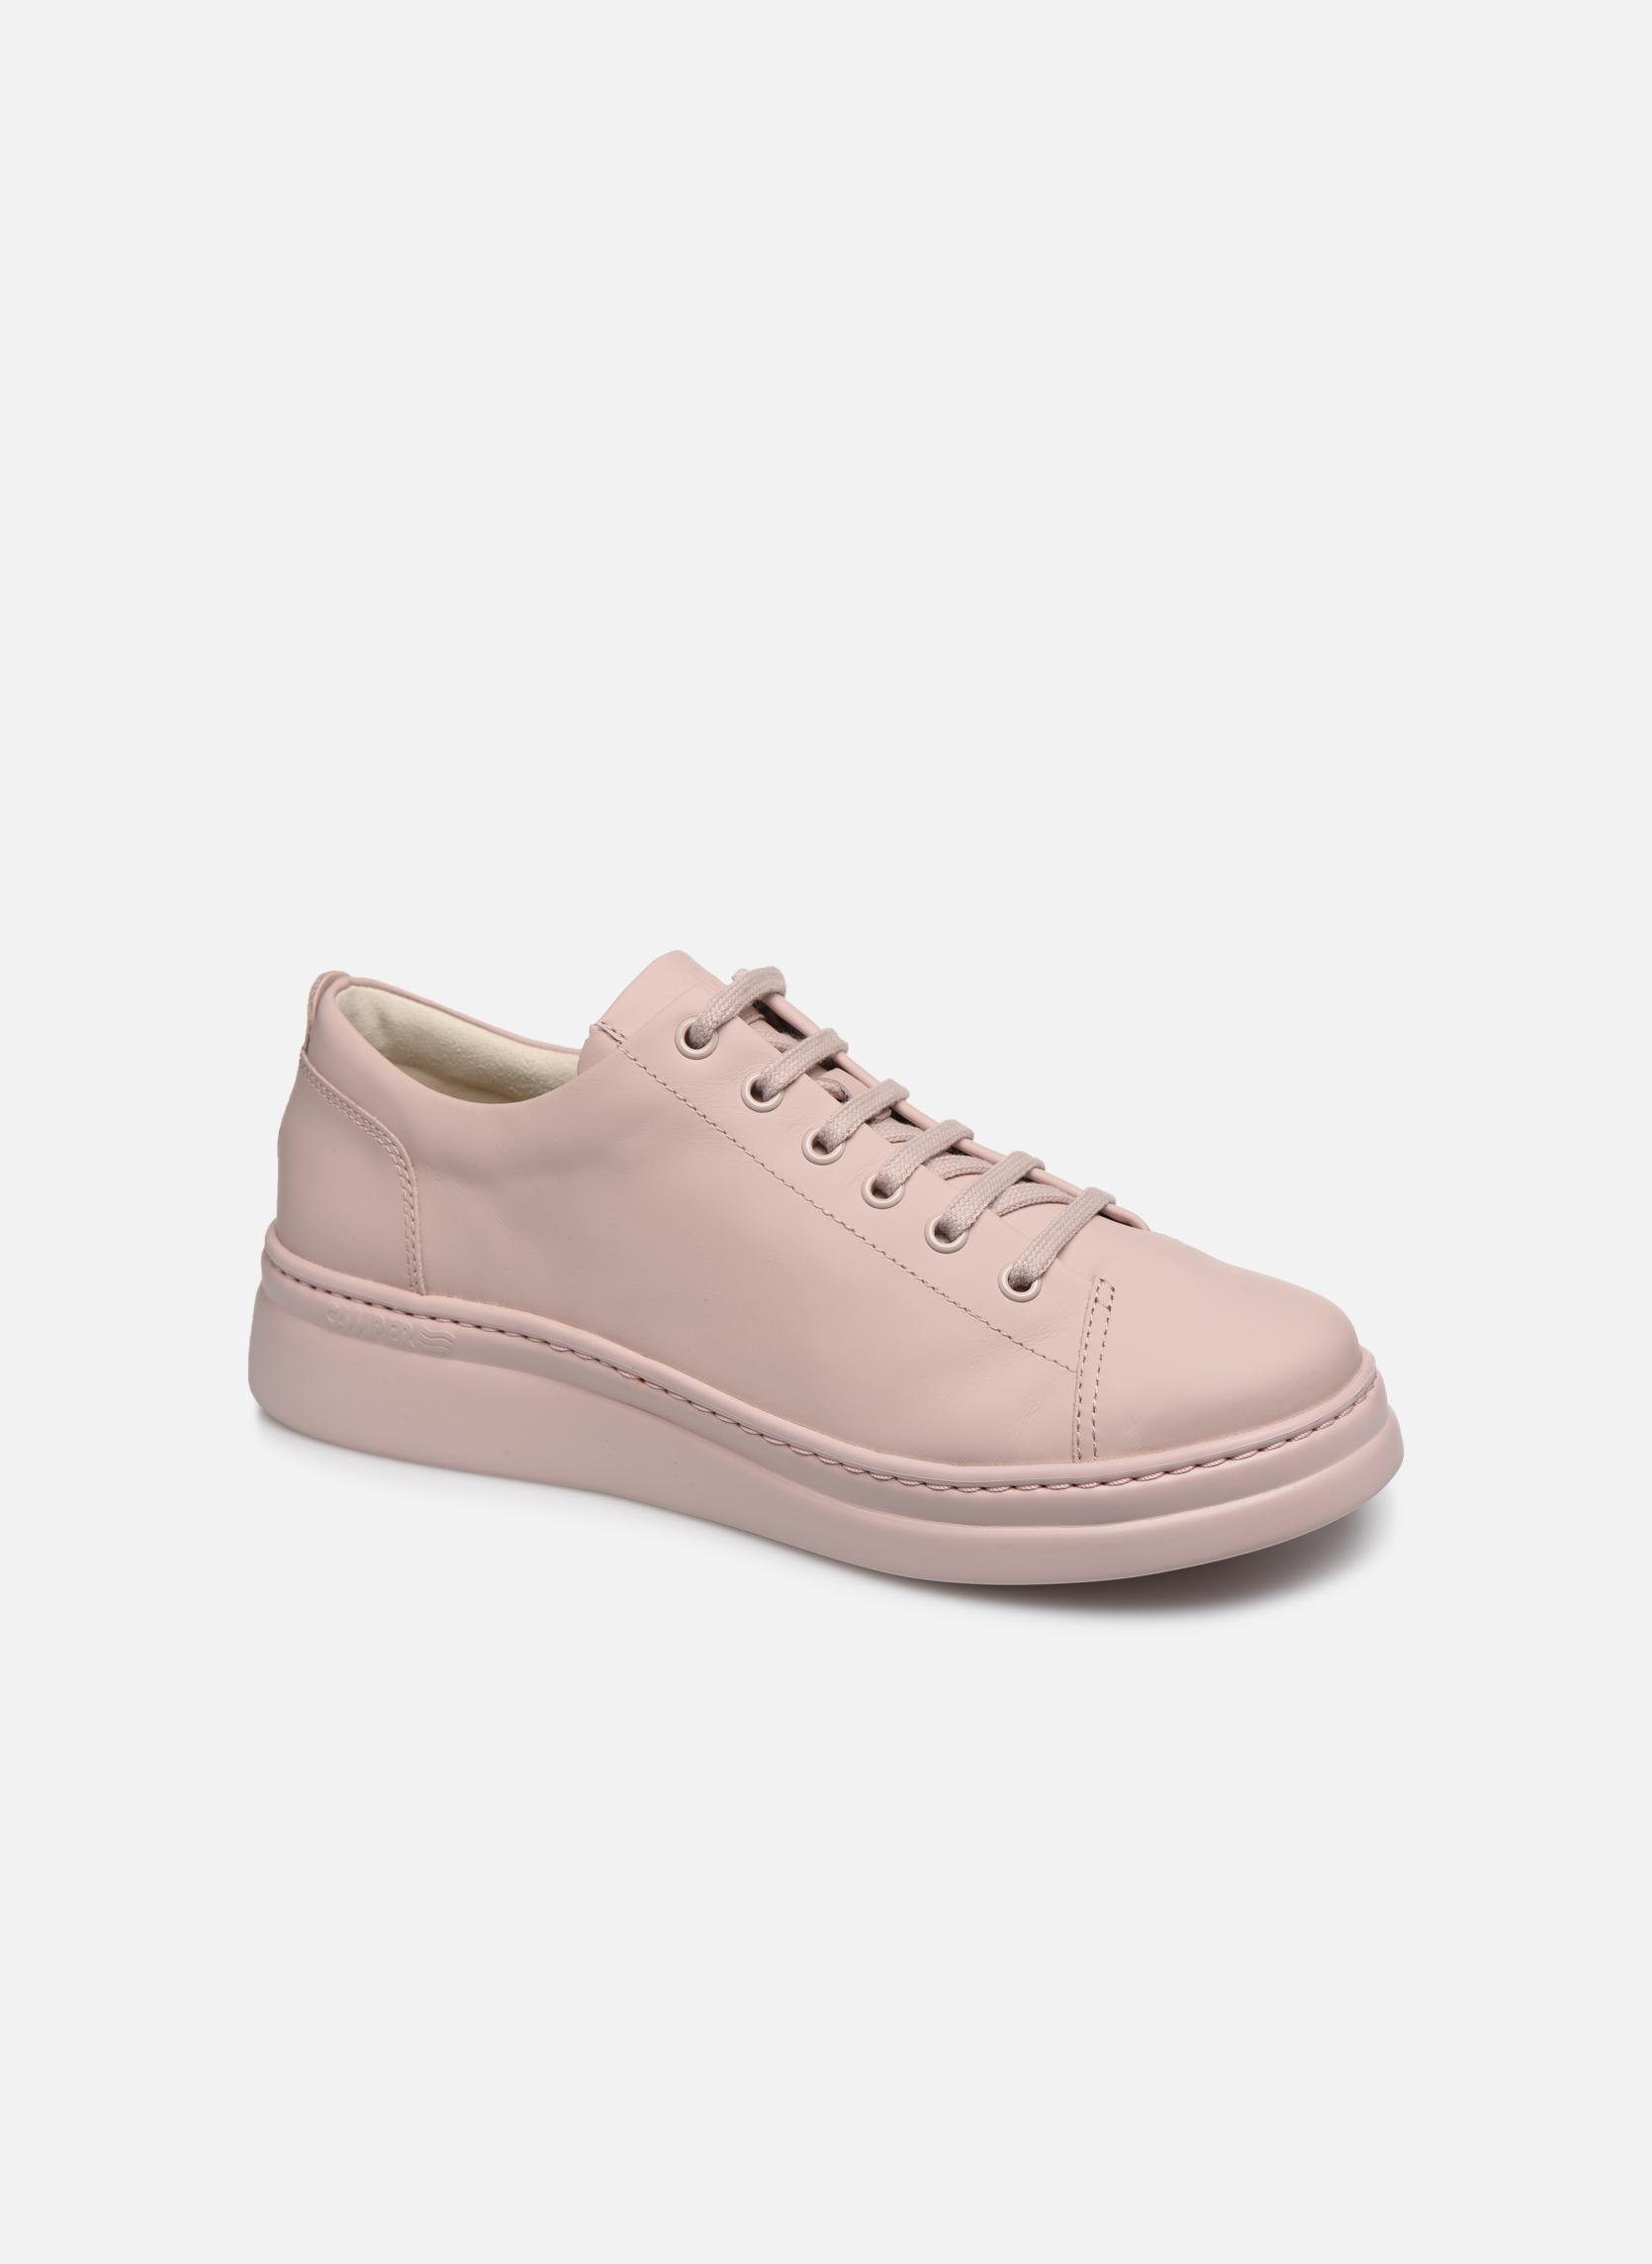 Runner K200508 Lt/Pastel Pink